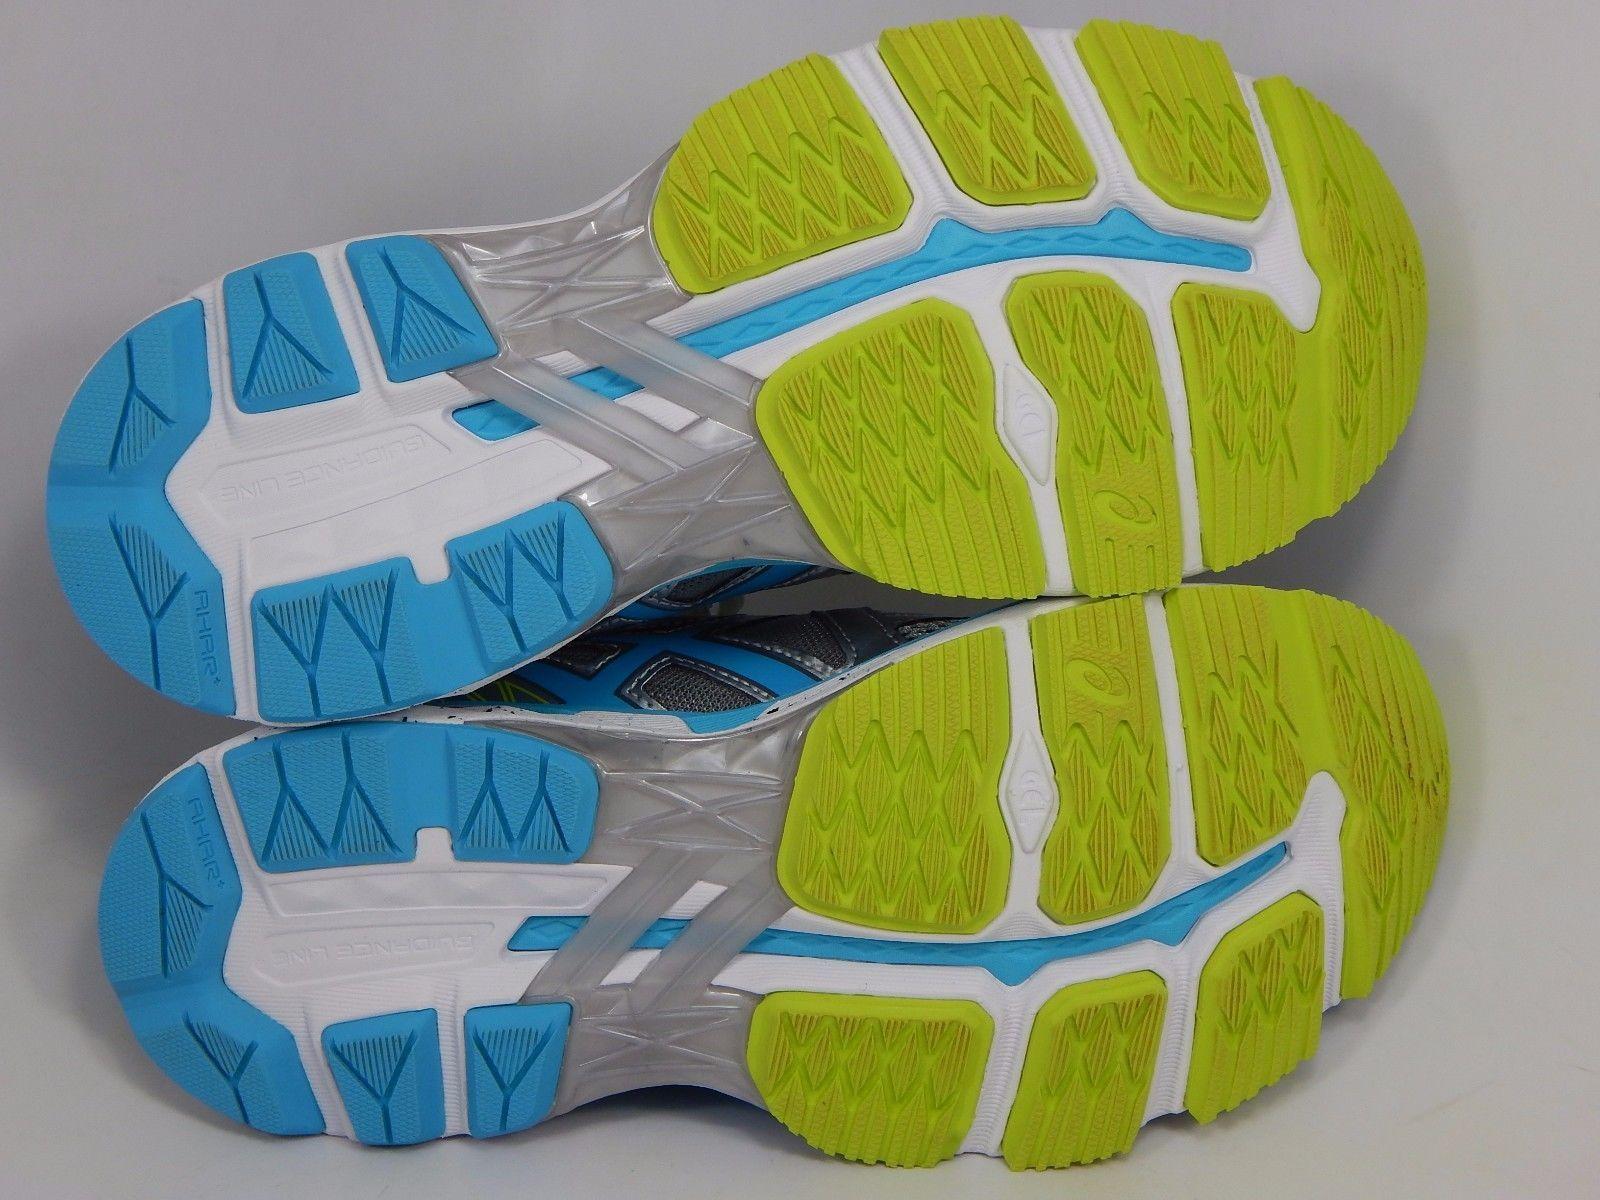 Asics GT 2000 v 4 Women's Running Shoes Size US 6 M (B) EU 37 Silver T656N